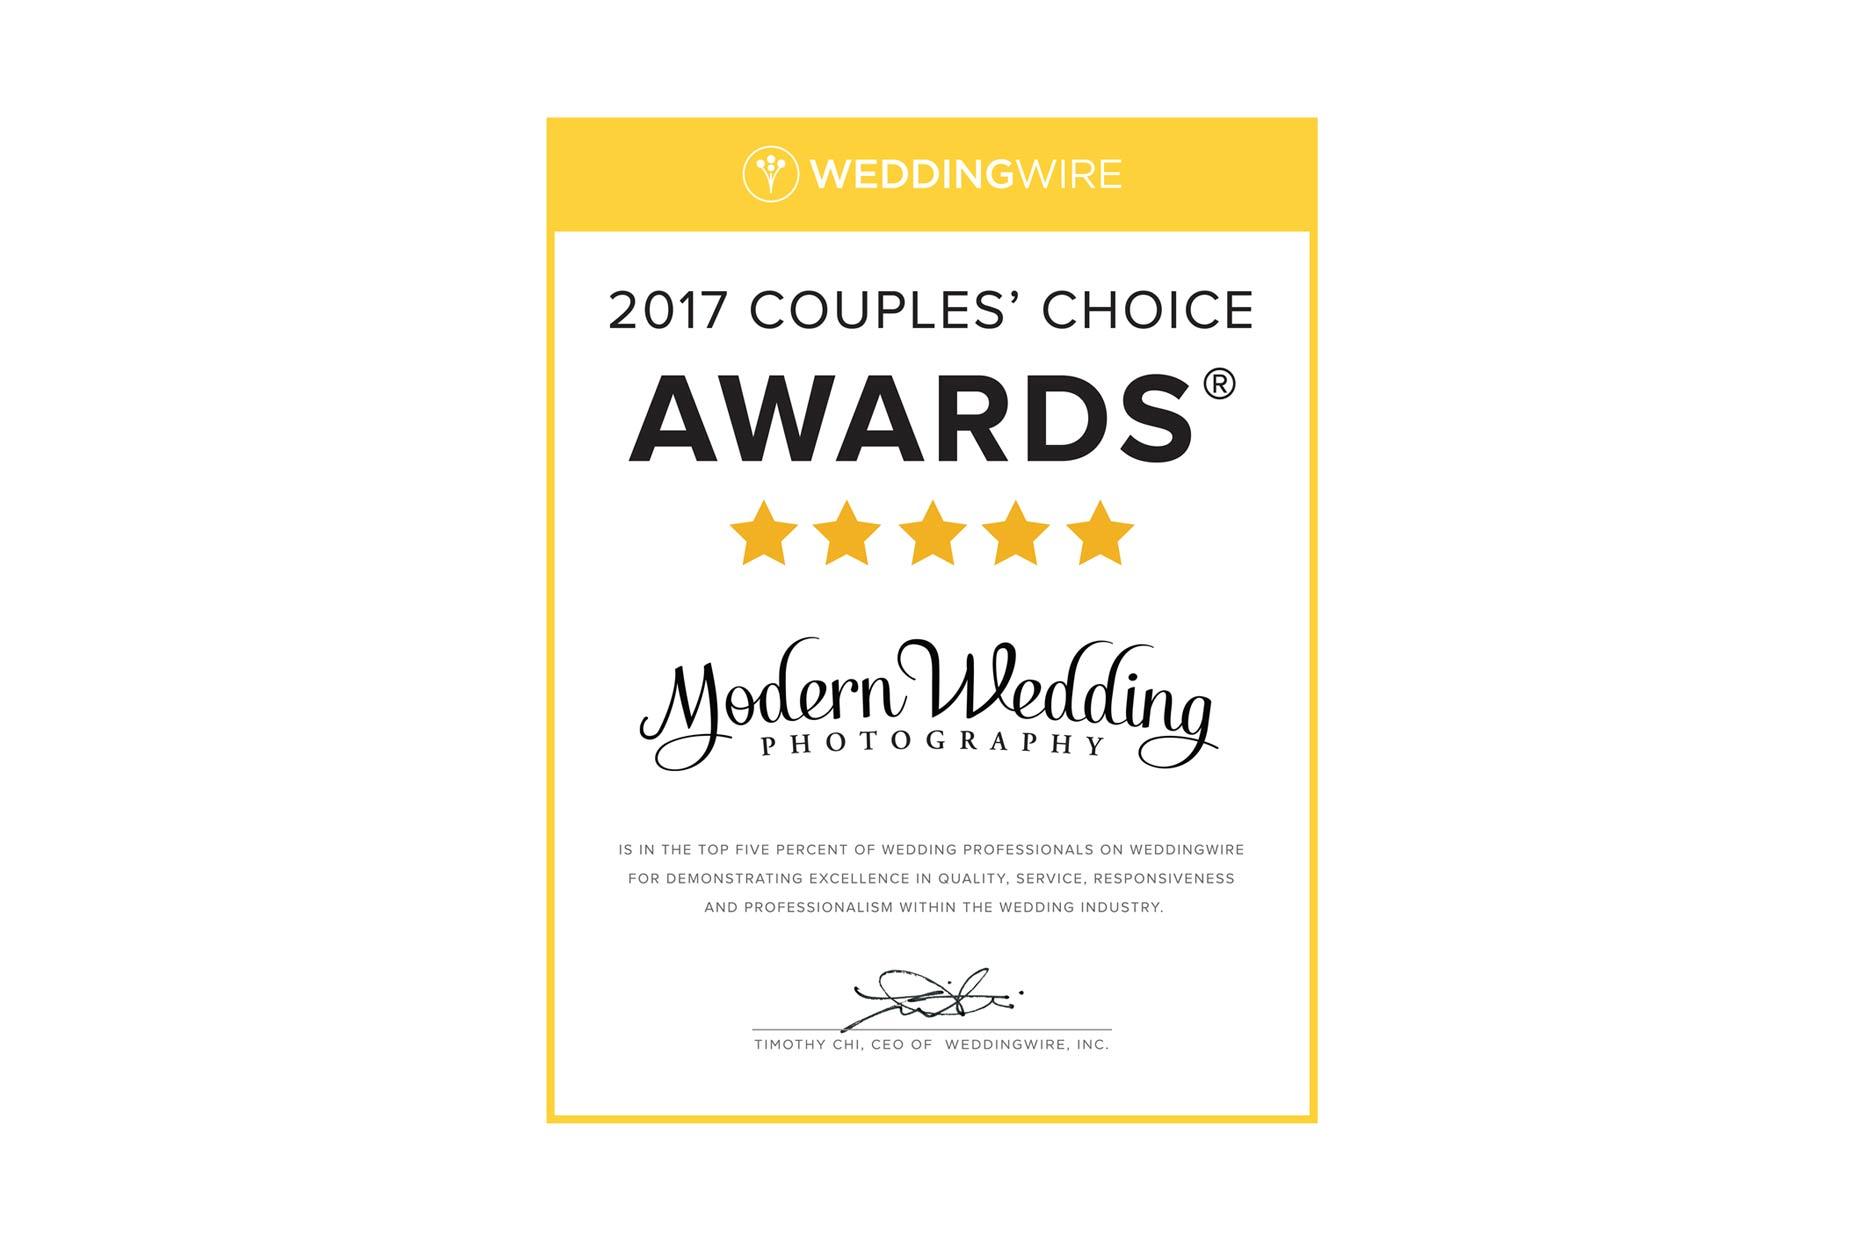 WeddingWire Award 2017